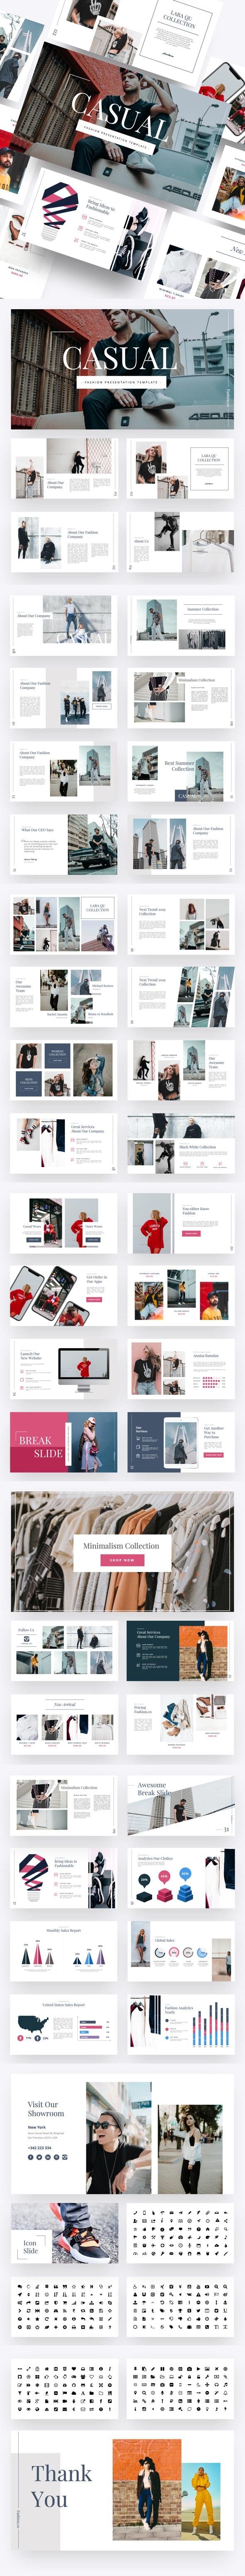 Casual - Fashion Google Slides Template - Google Slides Presentation Templates